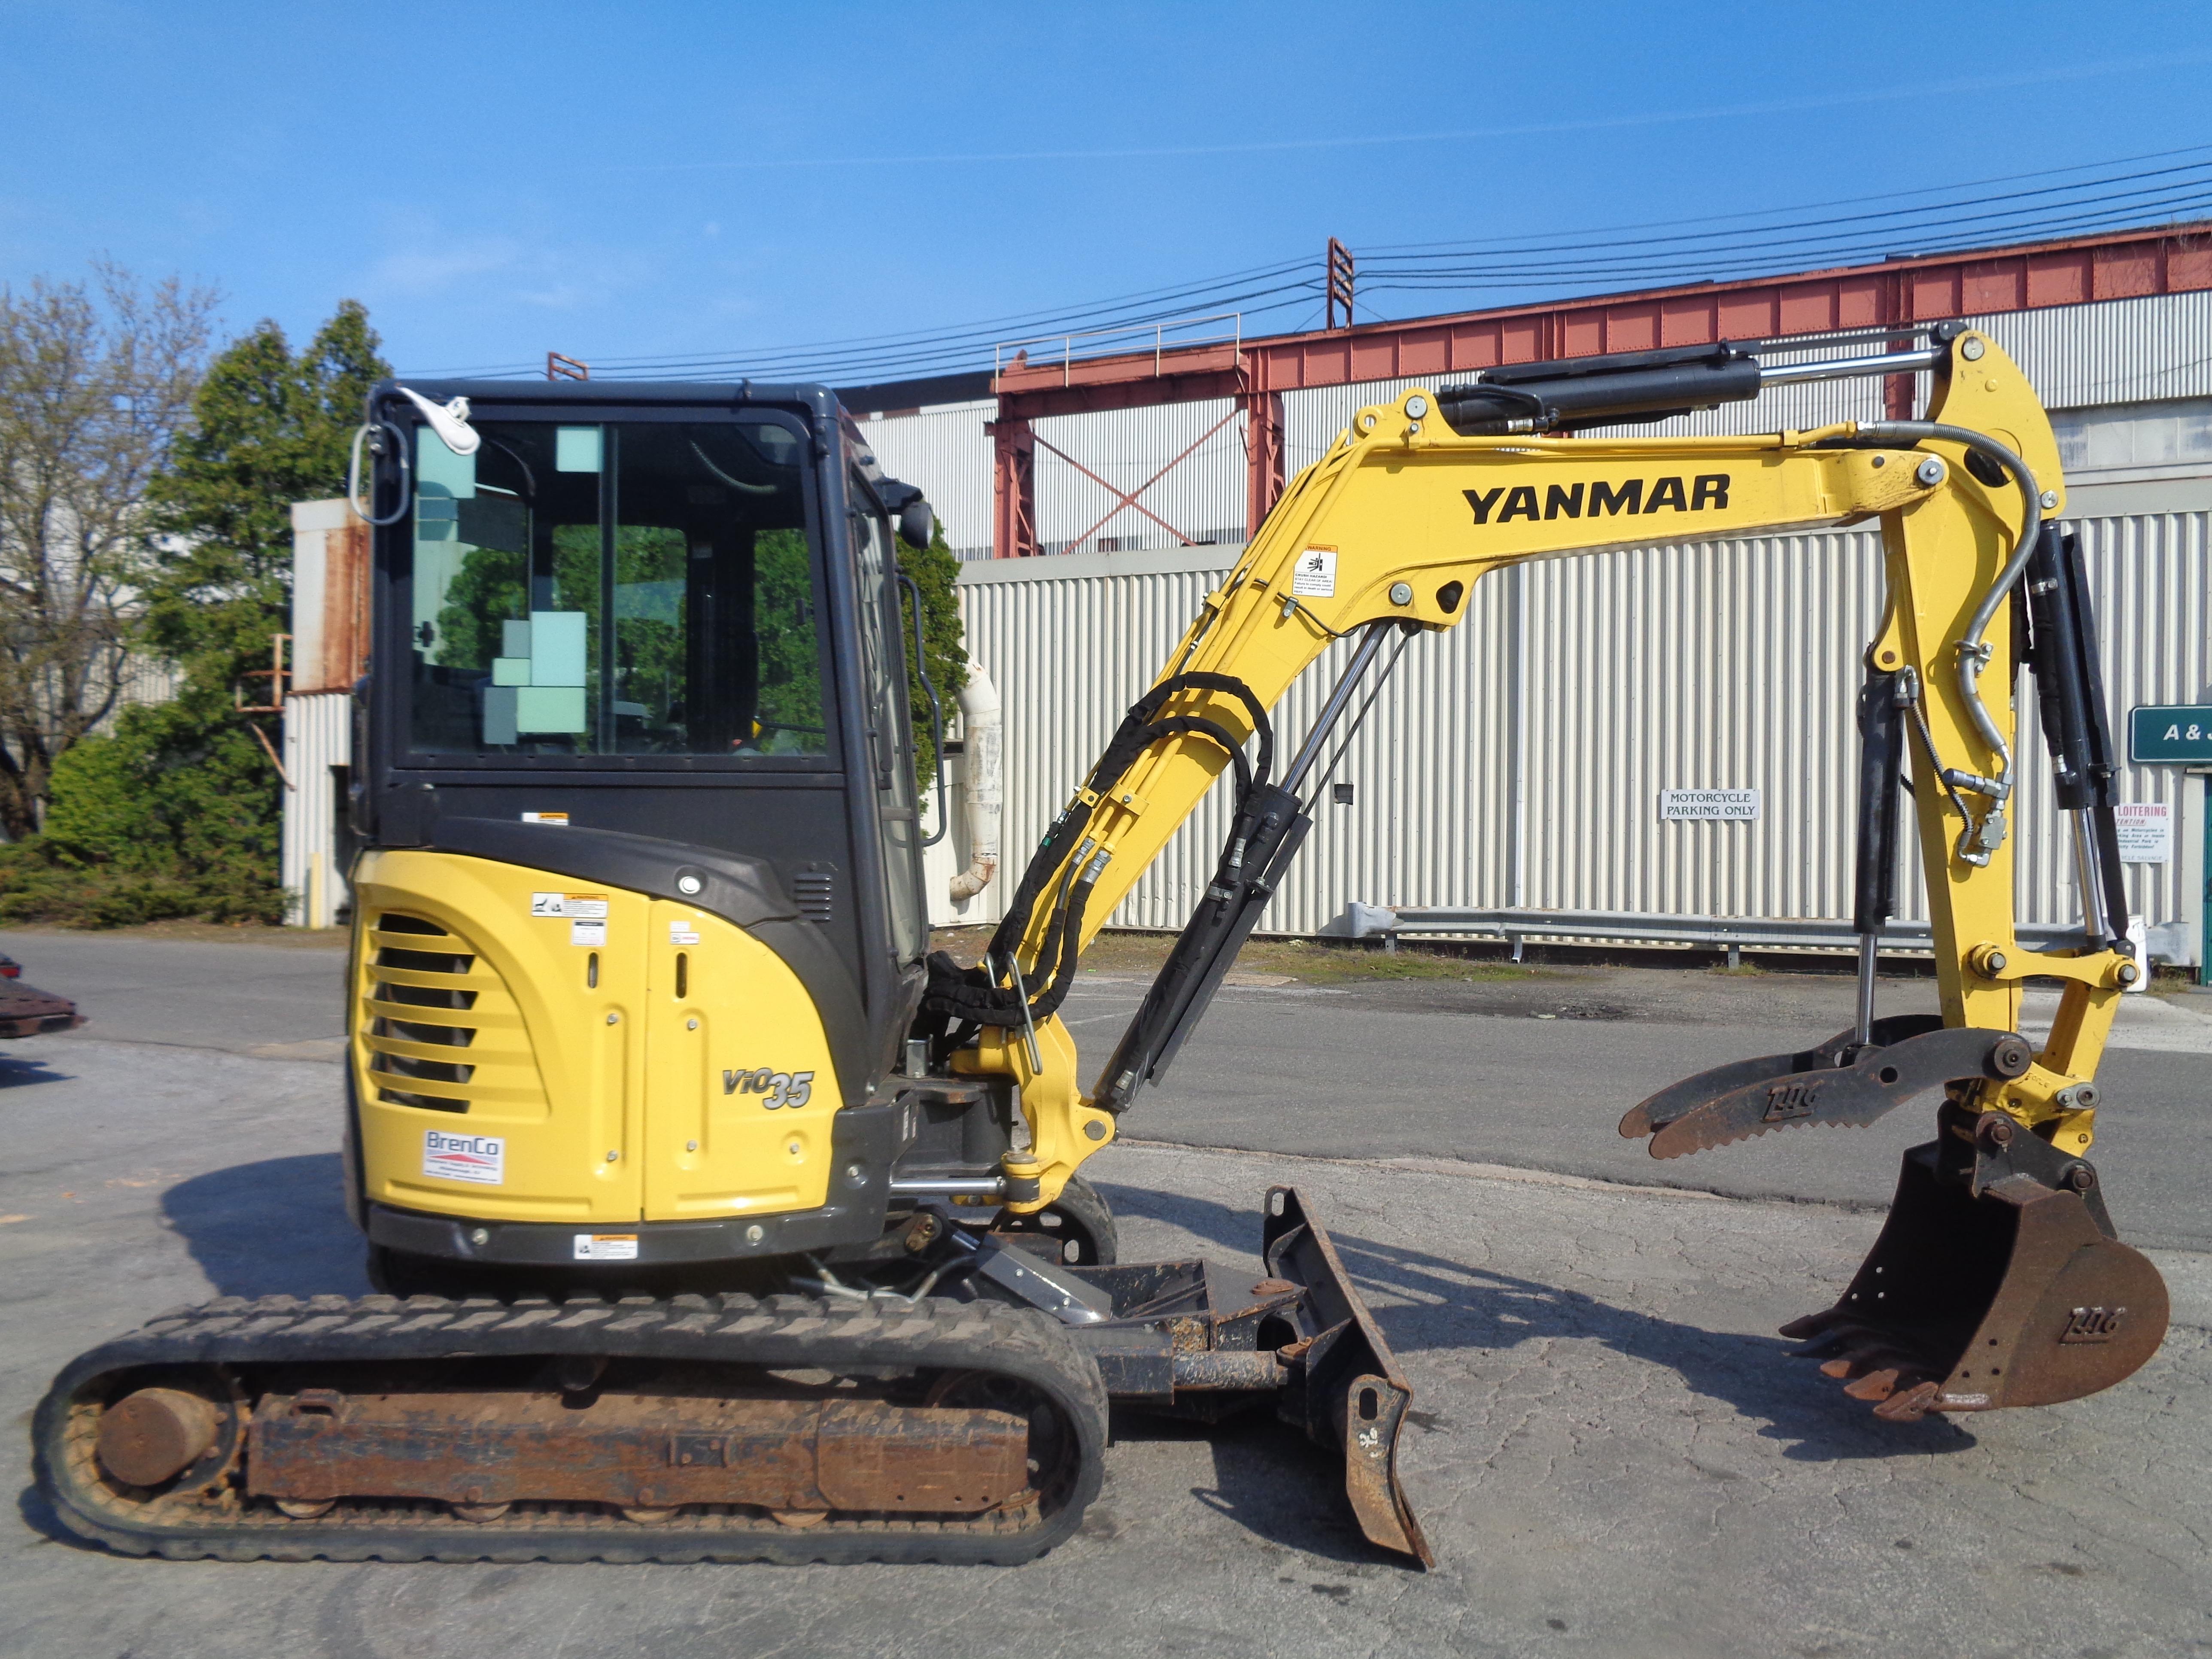 Lot 45 - 2018 Yanmar VIO35 6A Mini Excavator